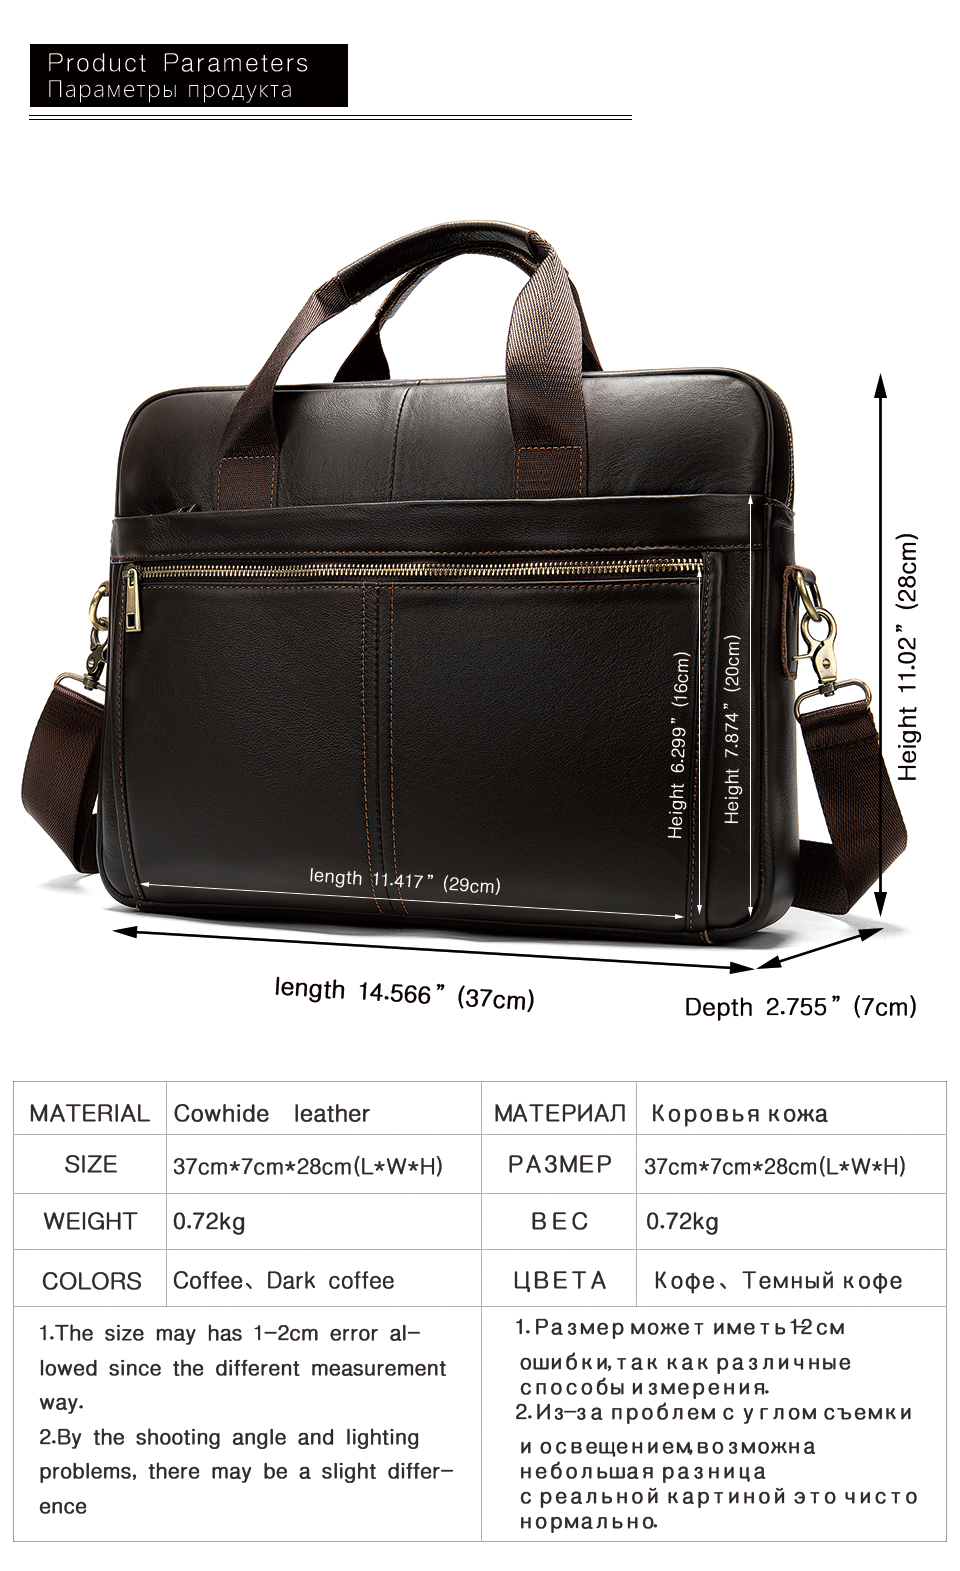 HTB1JlZBUhjaK1RjSZFAq6zdLFXar MVA men's briefcase/genuine Leather messenger bag men leather/business laptop office bags for men briefcases men's bags 8572